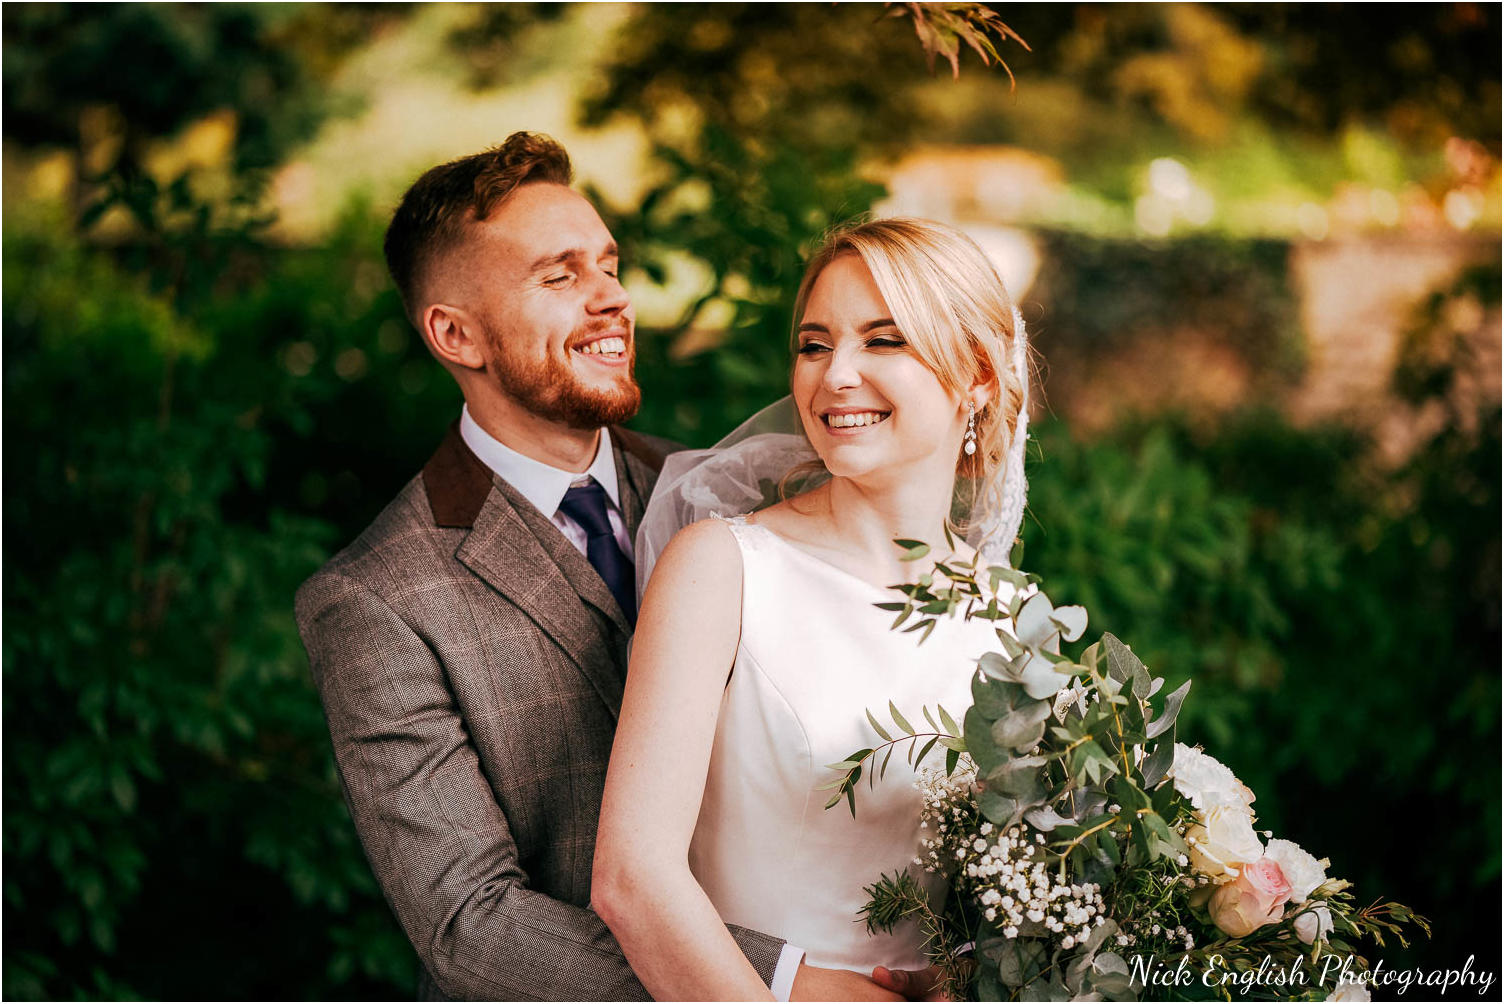 Eaves_Hall_Outdoor_Wedding_Photograph-58.jpg